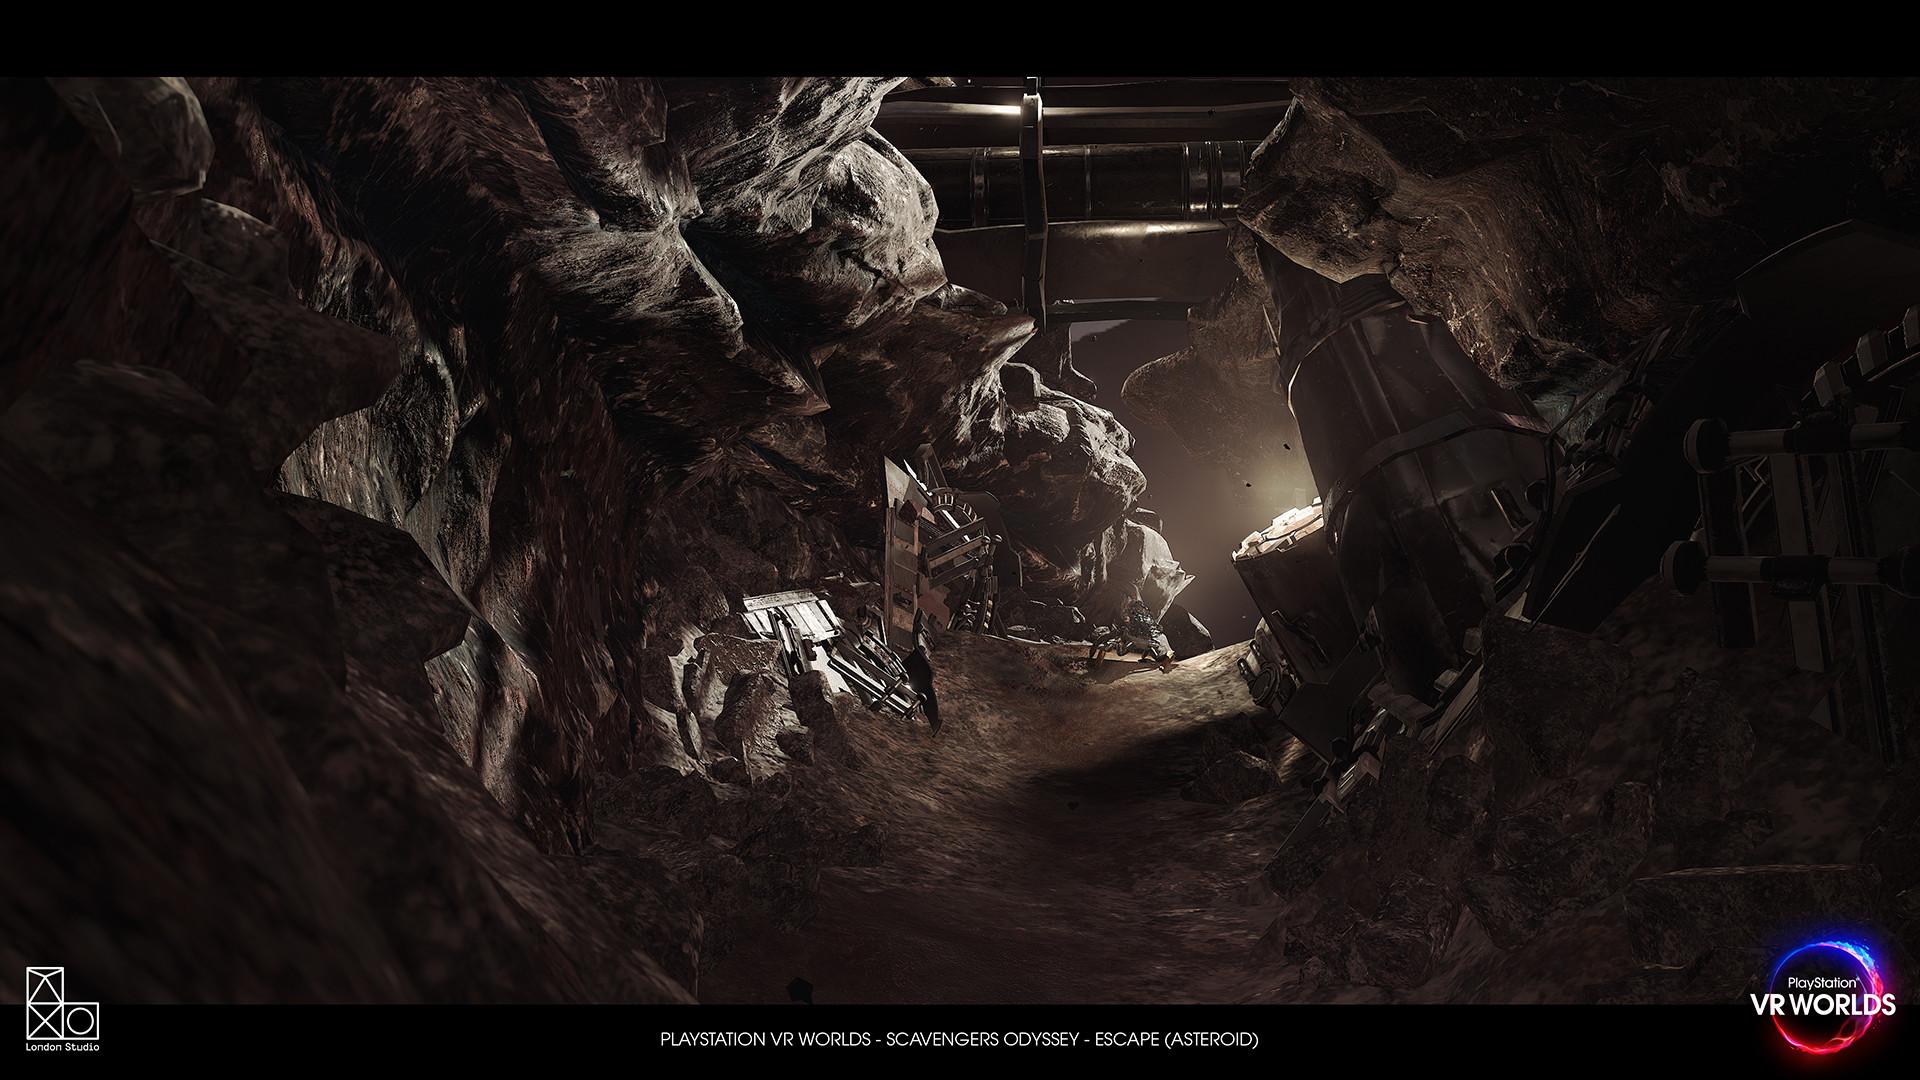 David nicholls escape asteroid 001